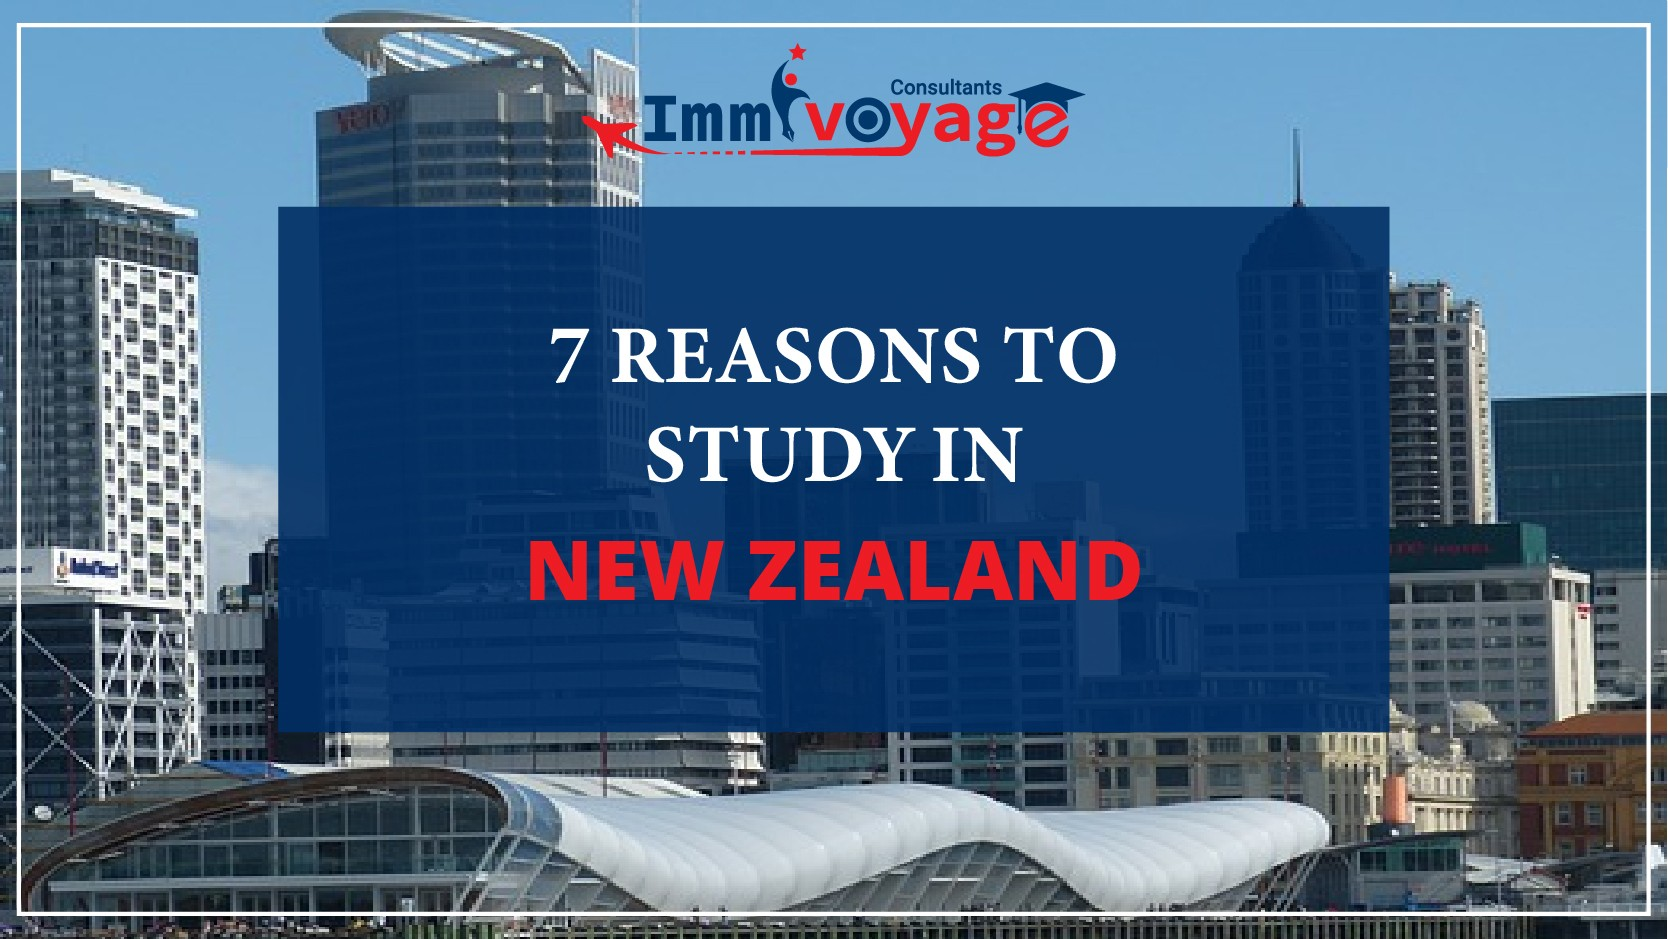 Reasonsto Study in New Zealand